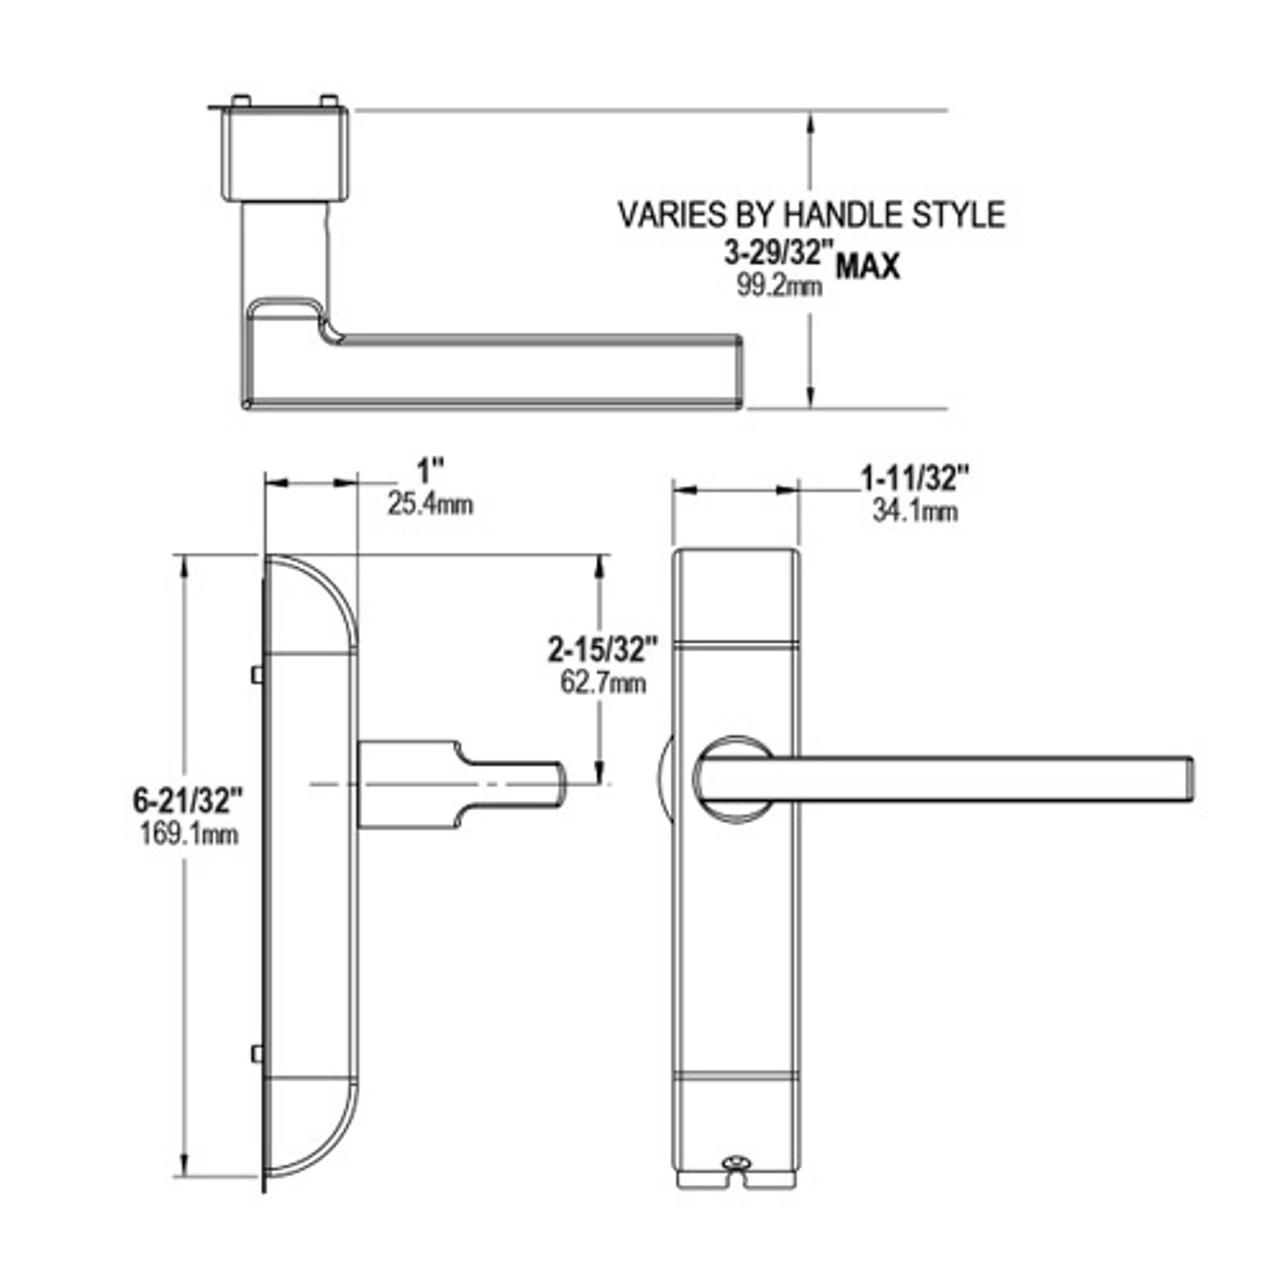 4600M-MD-612-US4 Adams Rite MD Designer handle Dimensional View